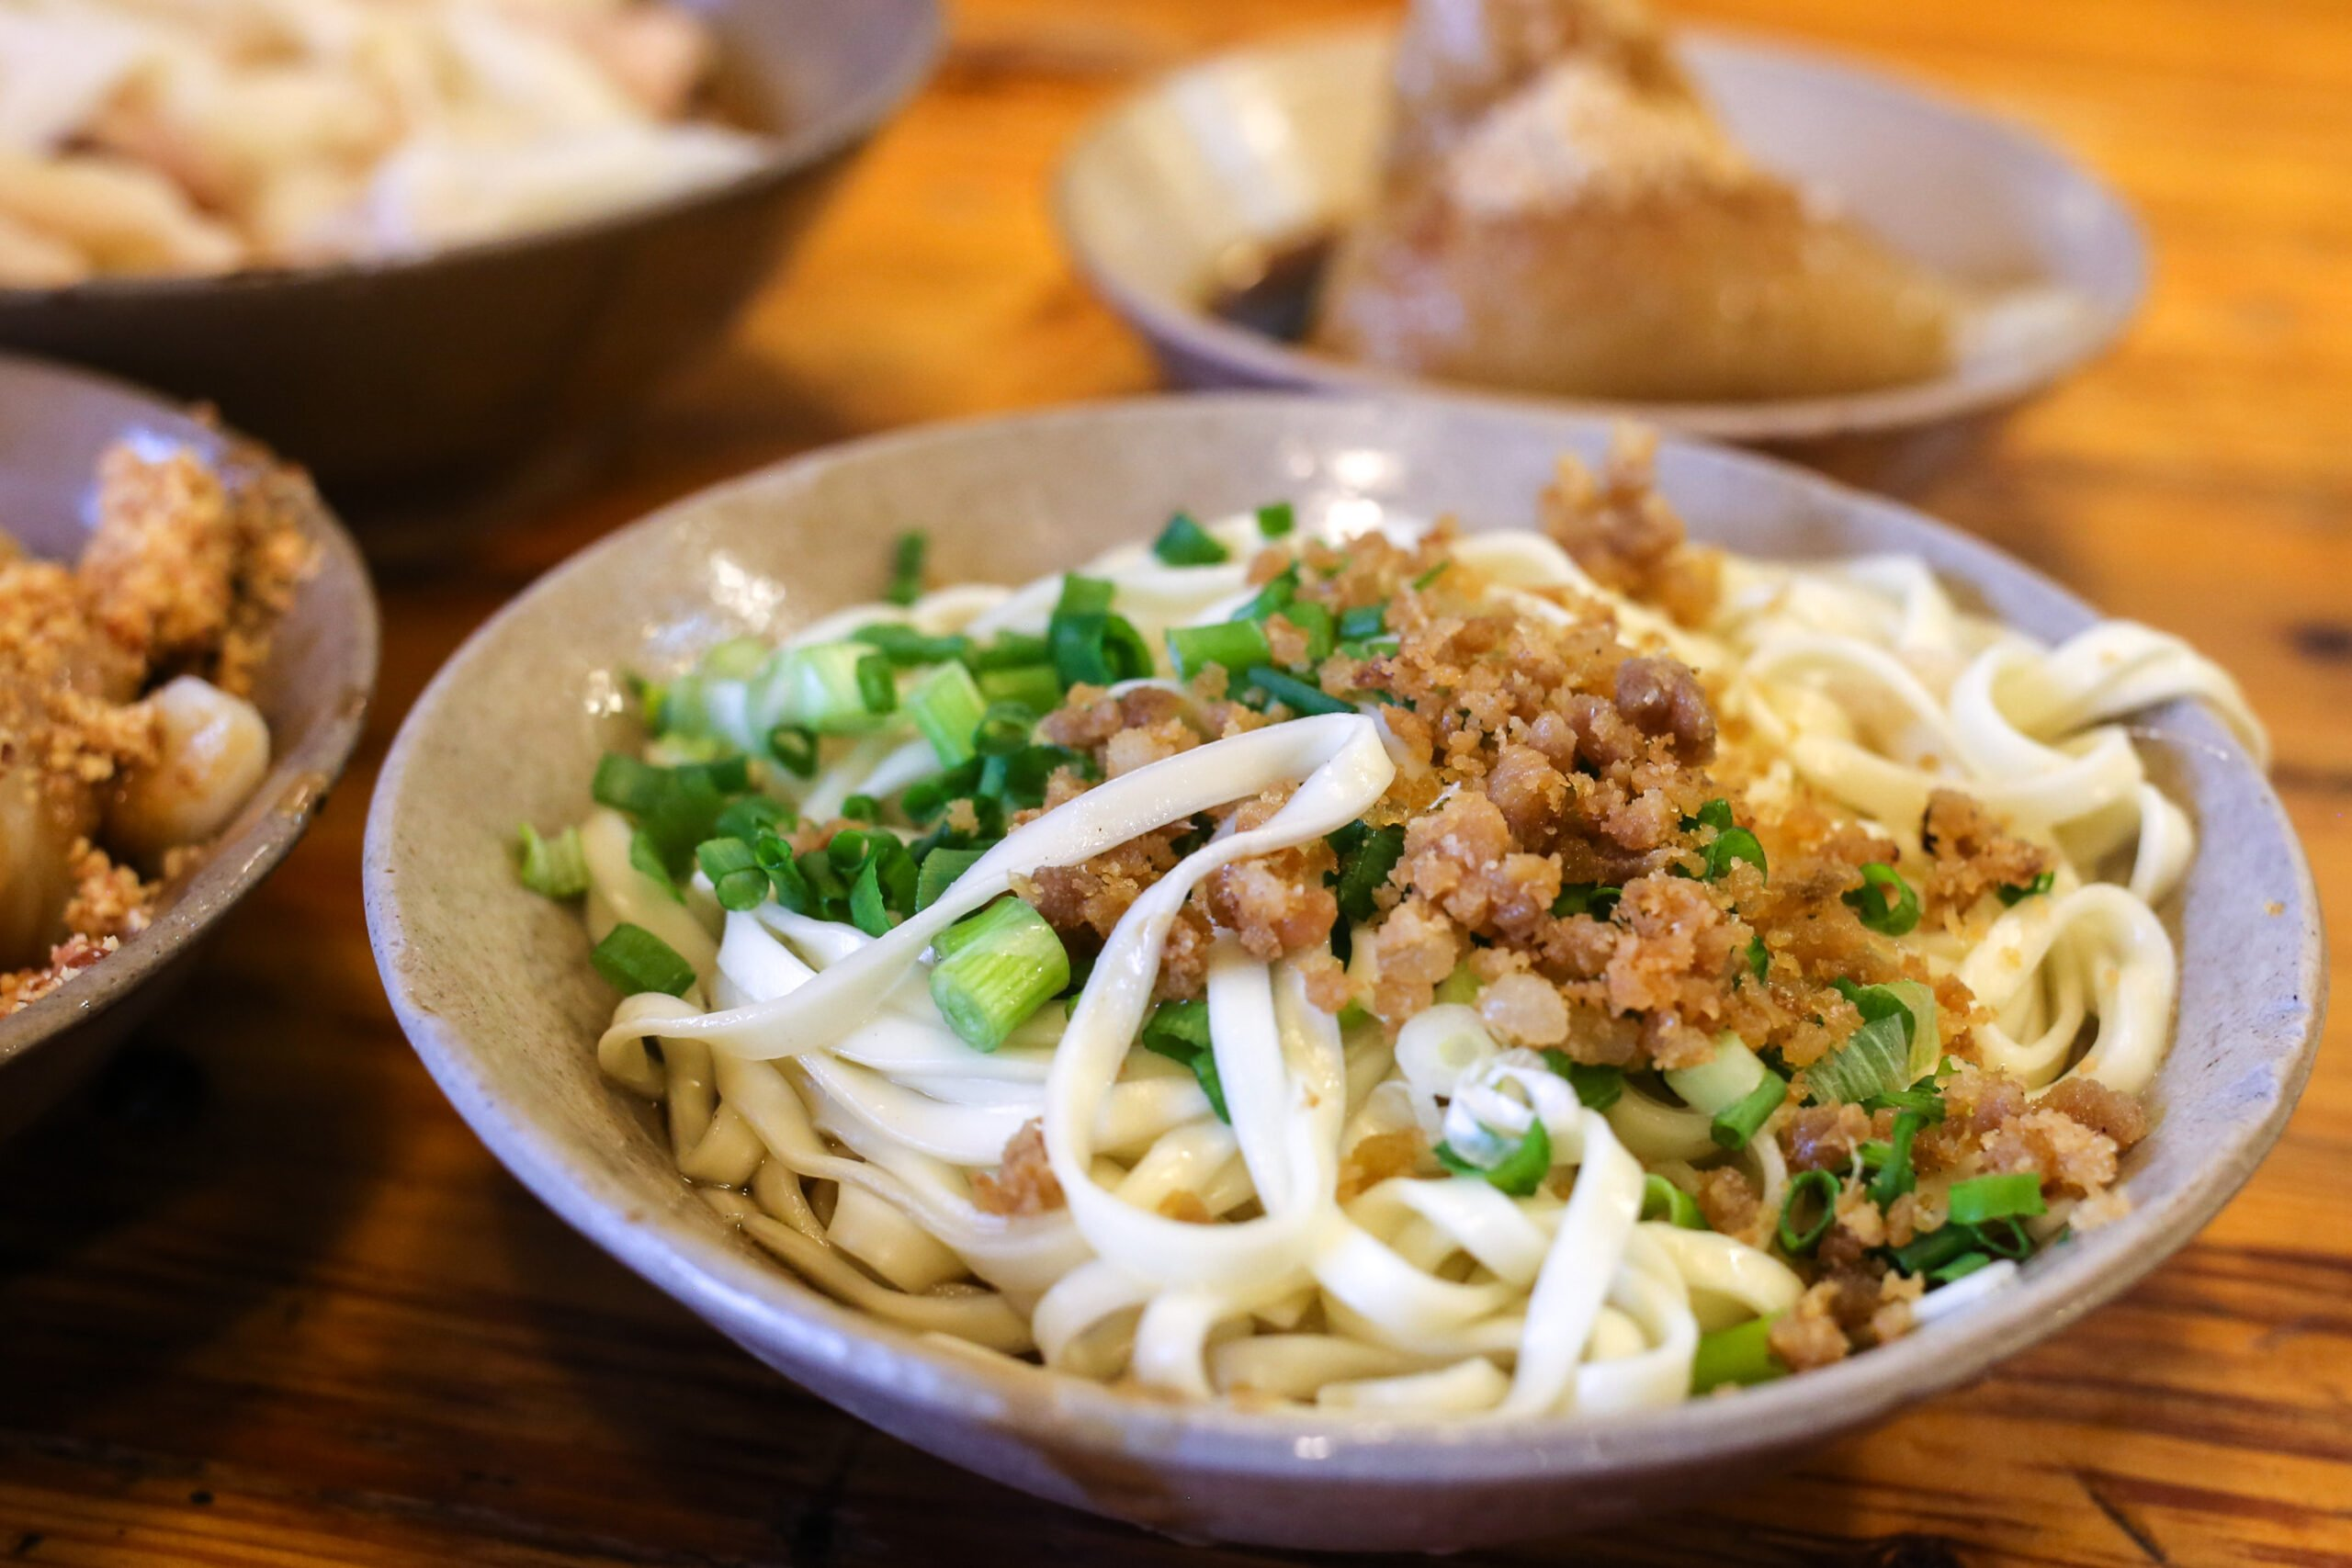 Learn About Dan Dan Noodles During Our Chengdu Evening Food Tour